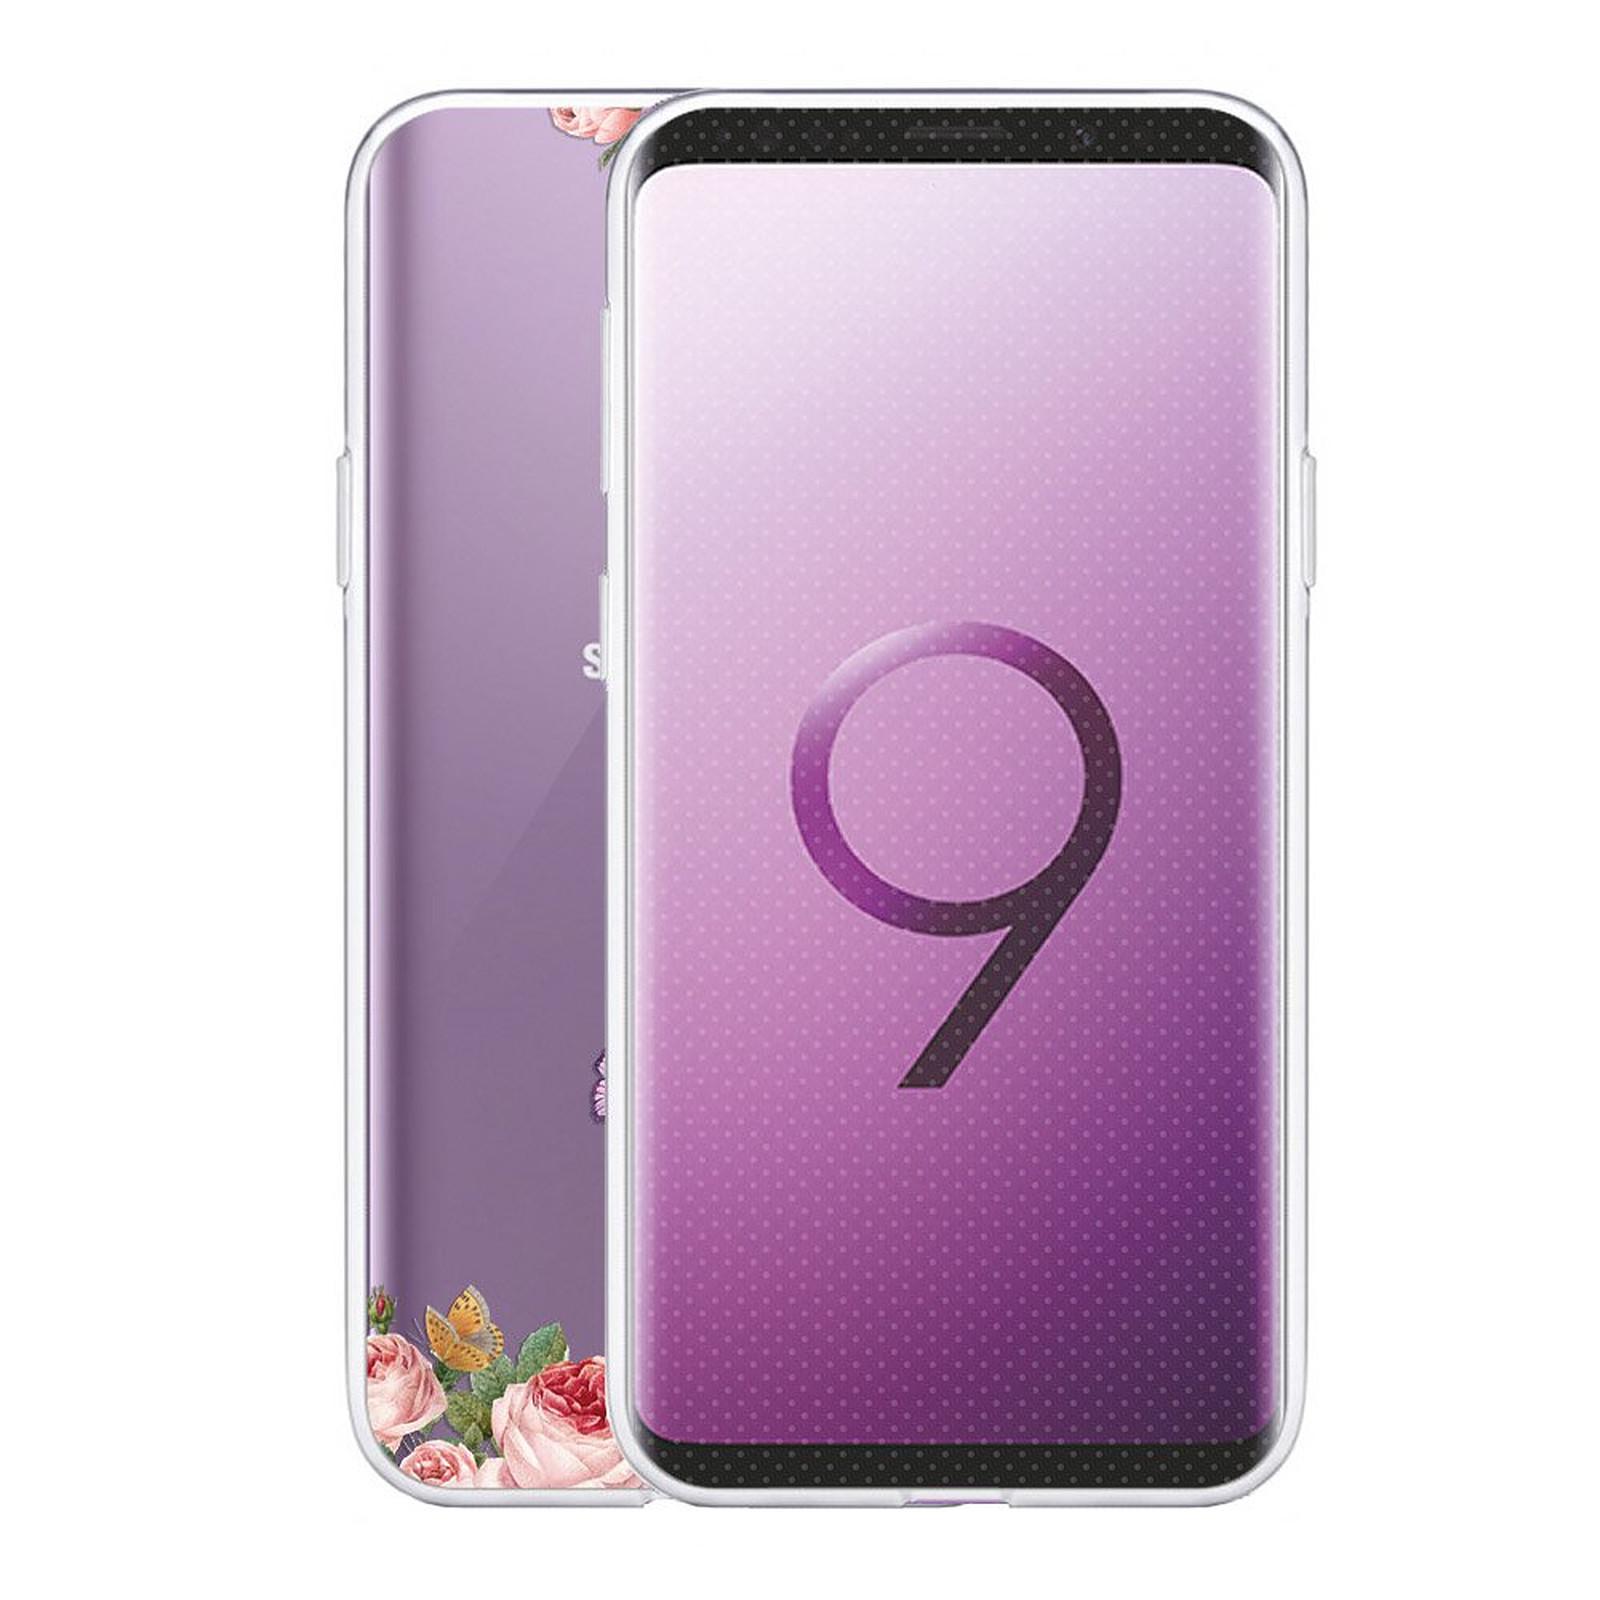 EVETANE Coque Samsung Galaxy S9 360 intégrale transparente Fée papillon fleurale Tendance